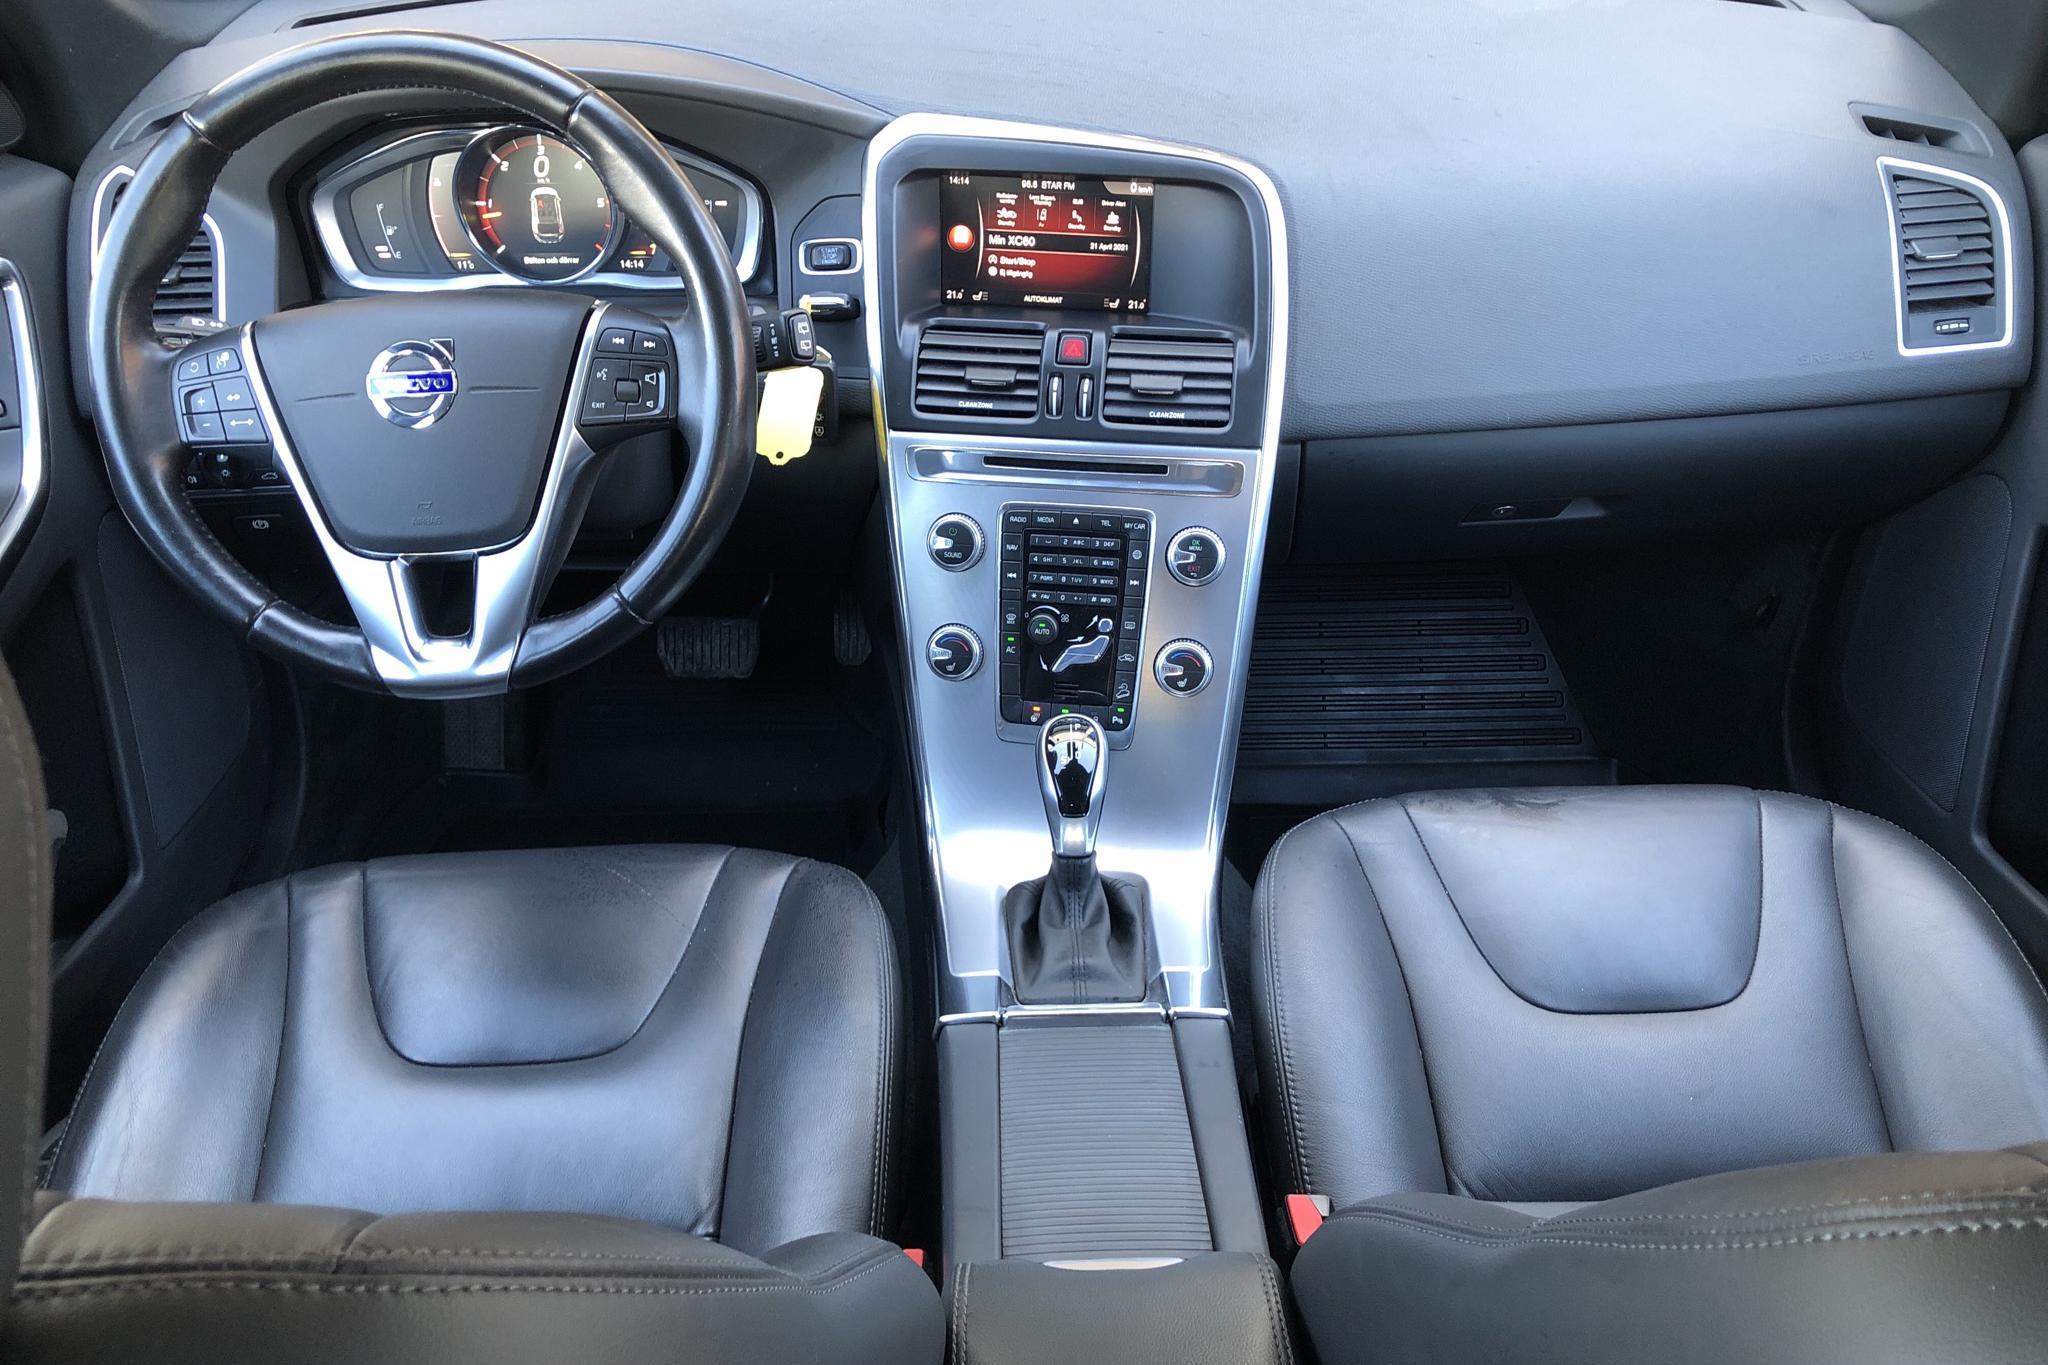 Volvo XC60 D4 AWD (190hk) - 99 290 km - Automatic - black - 2017